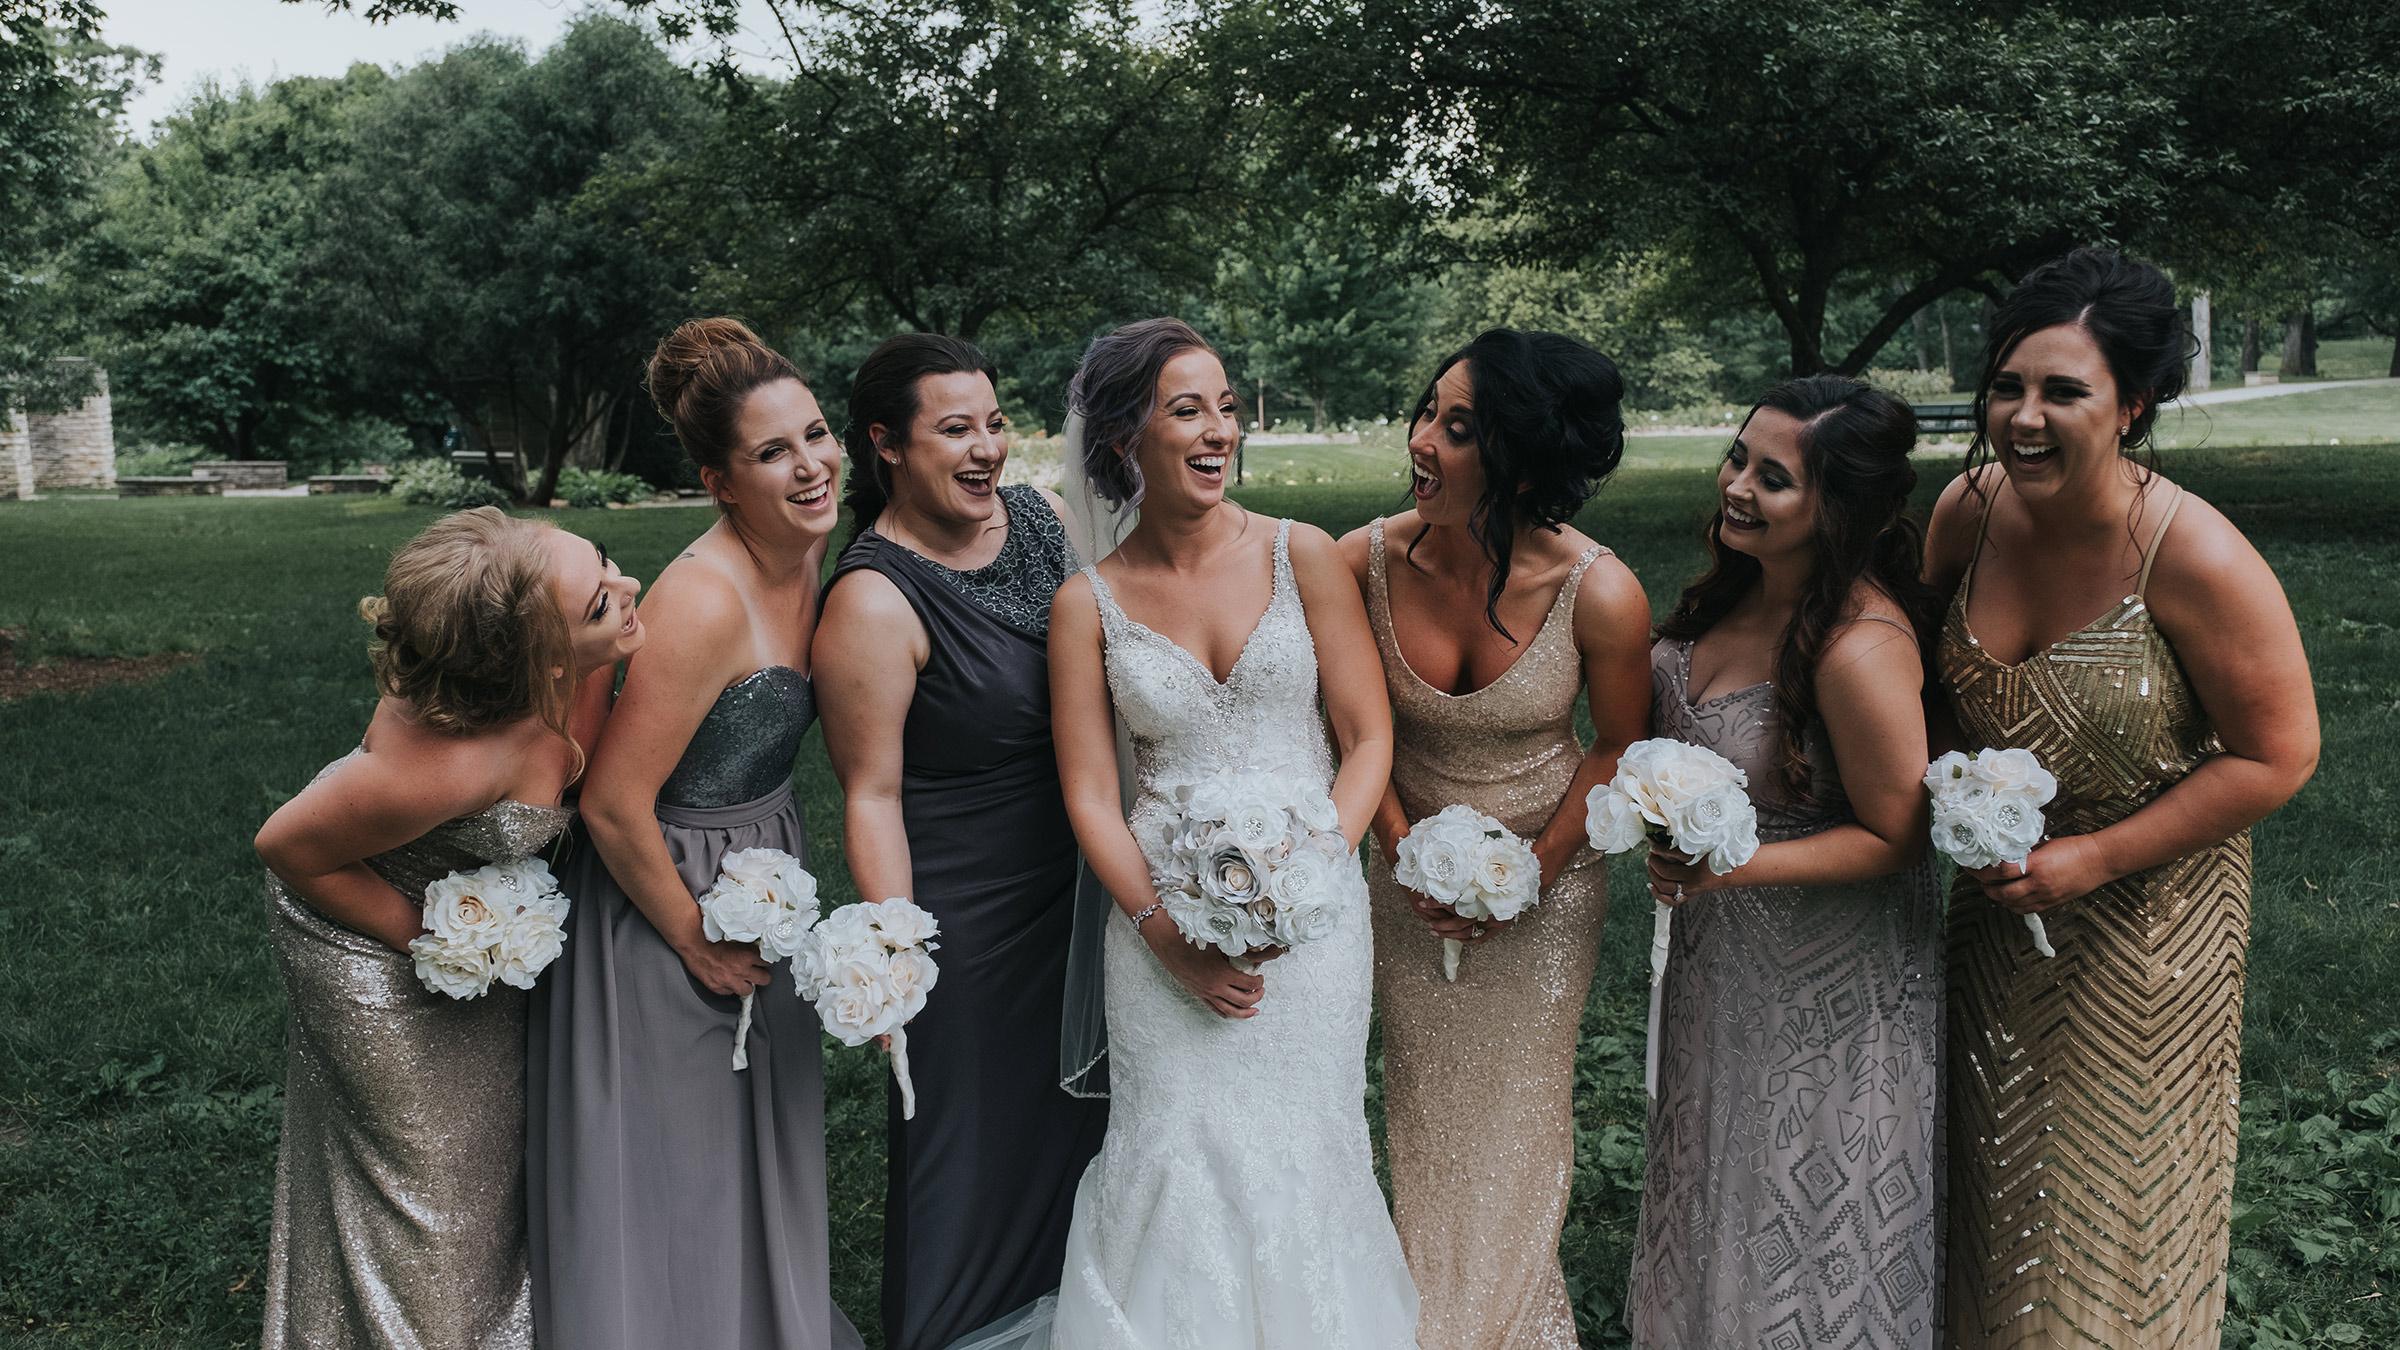 bridesmaids-laughing-at-bride-desmoines-iowa-art-center-raelyn-ramey-photography.jpg